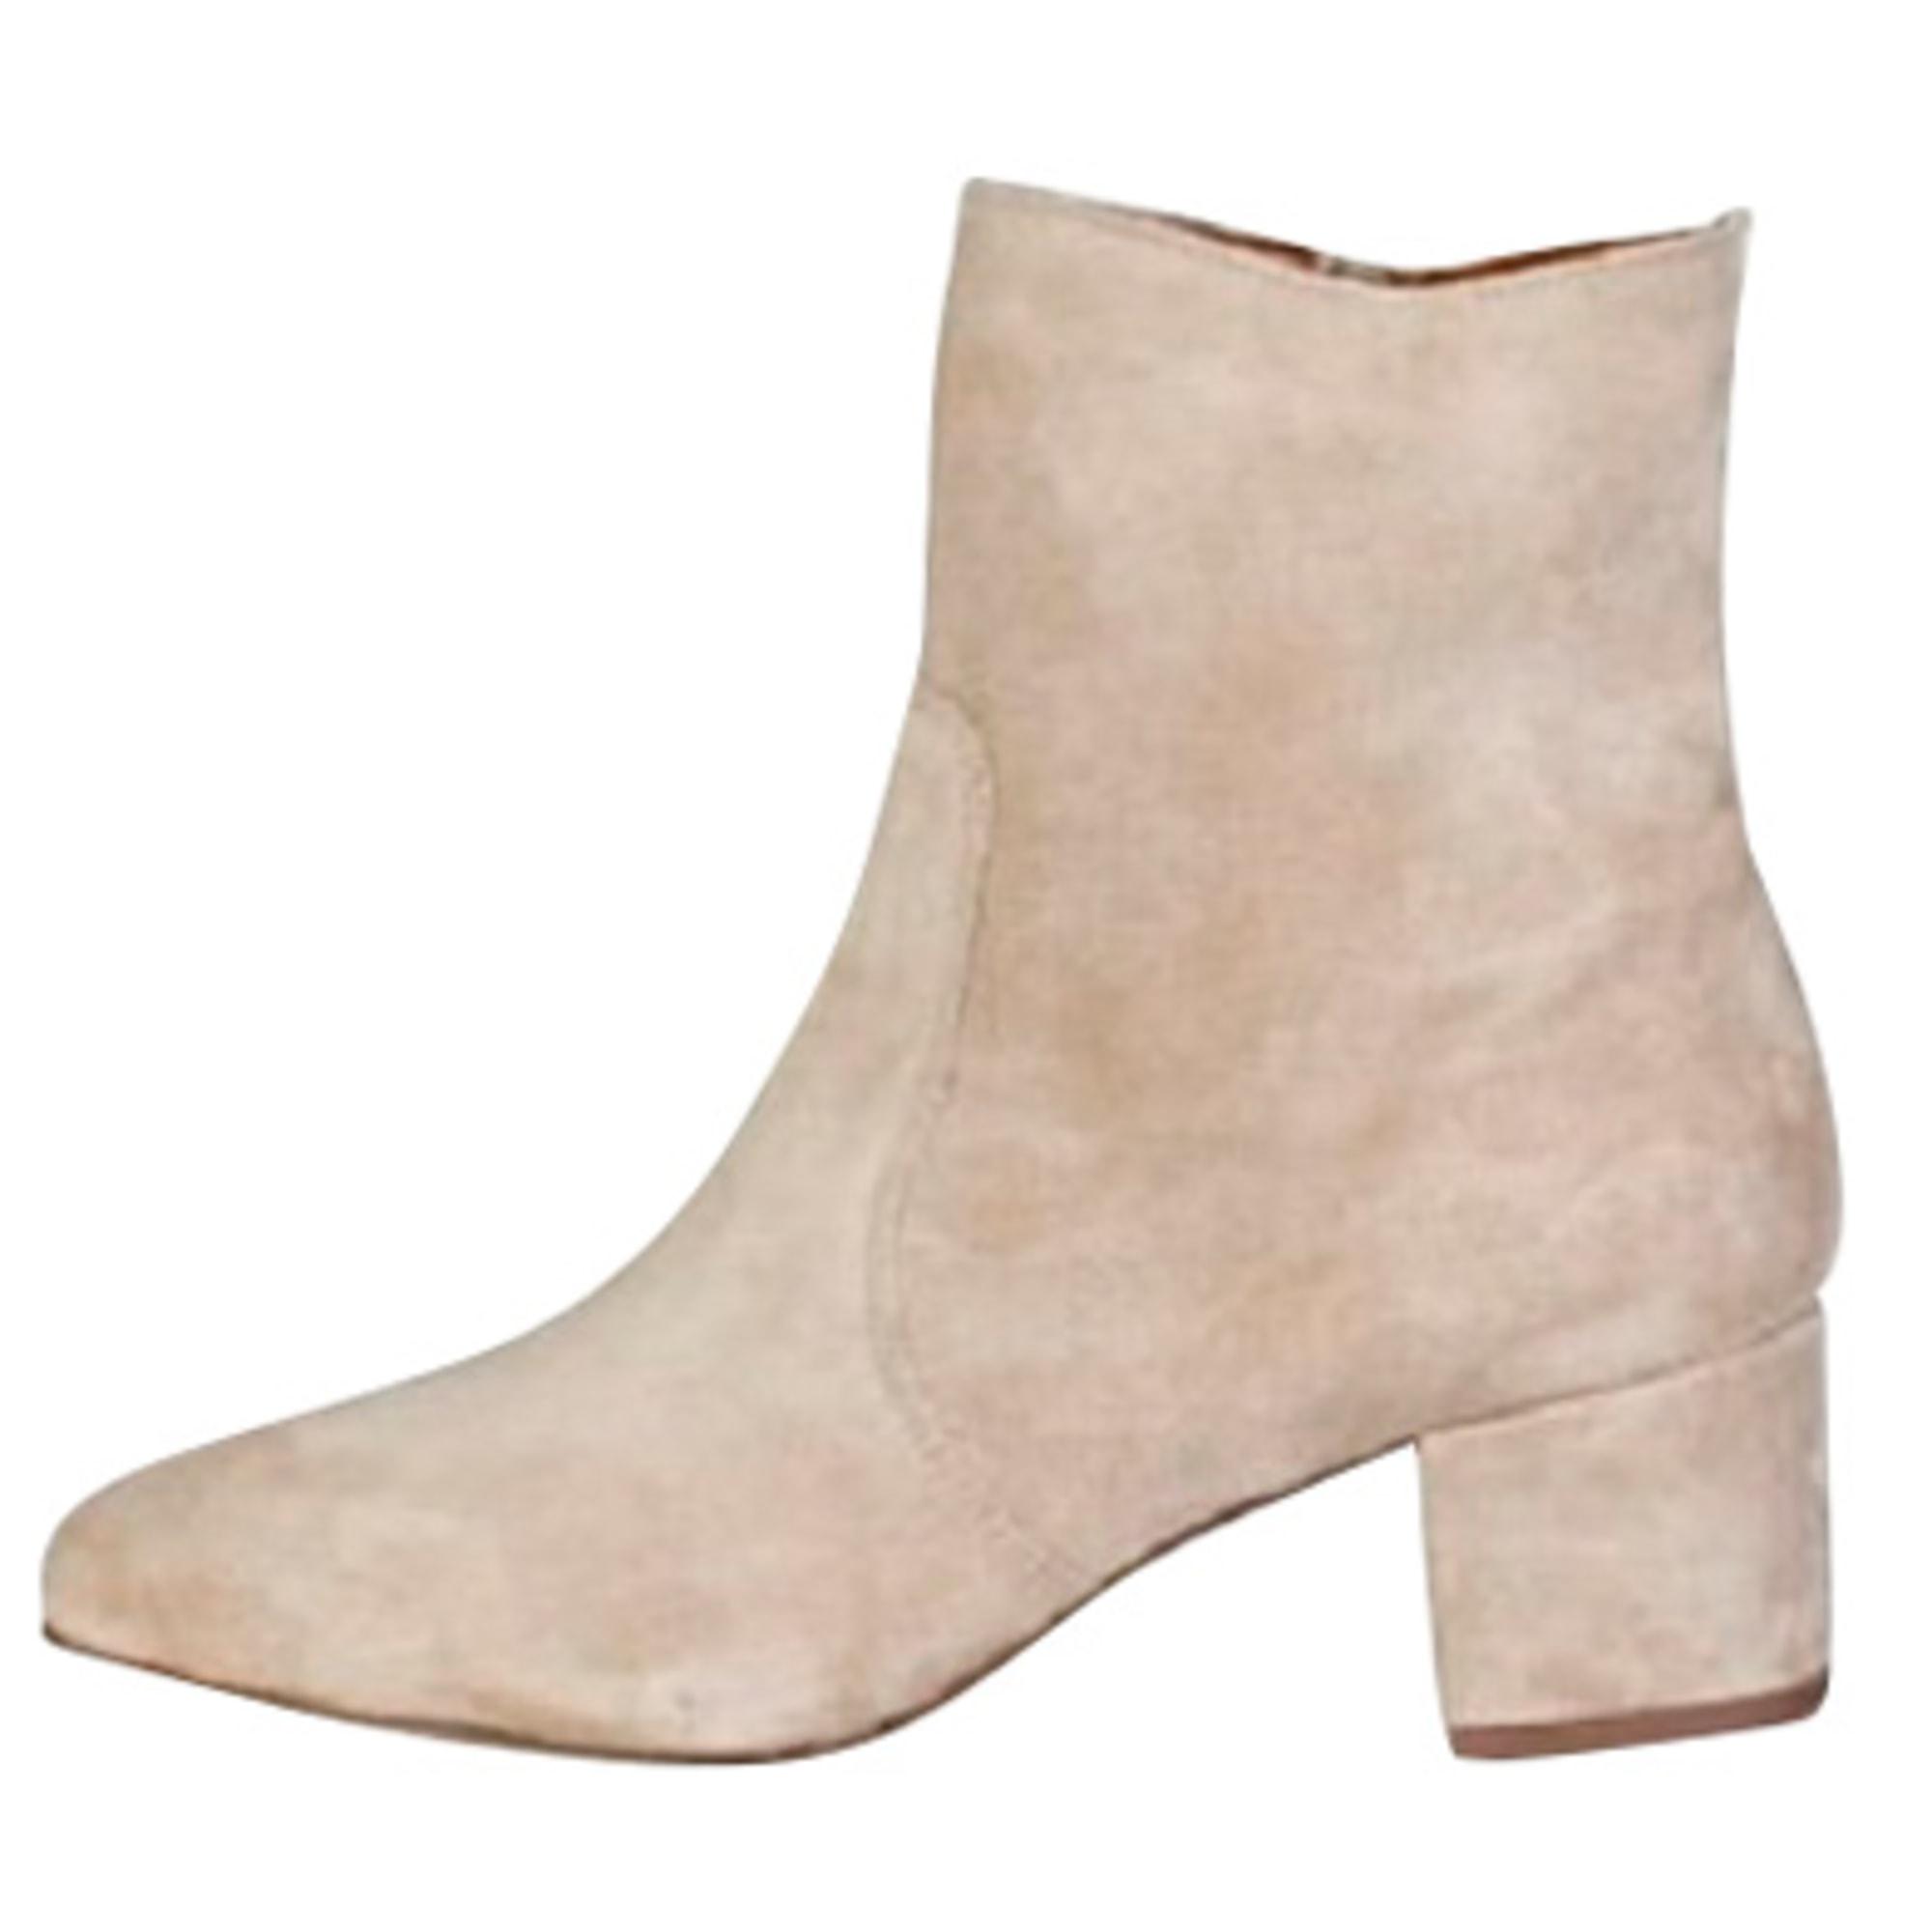 Bottines & low boots à talons V 19.69 Beige, camel